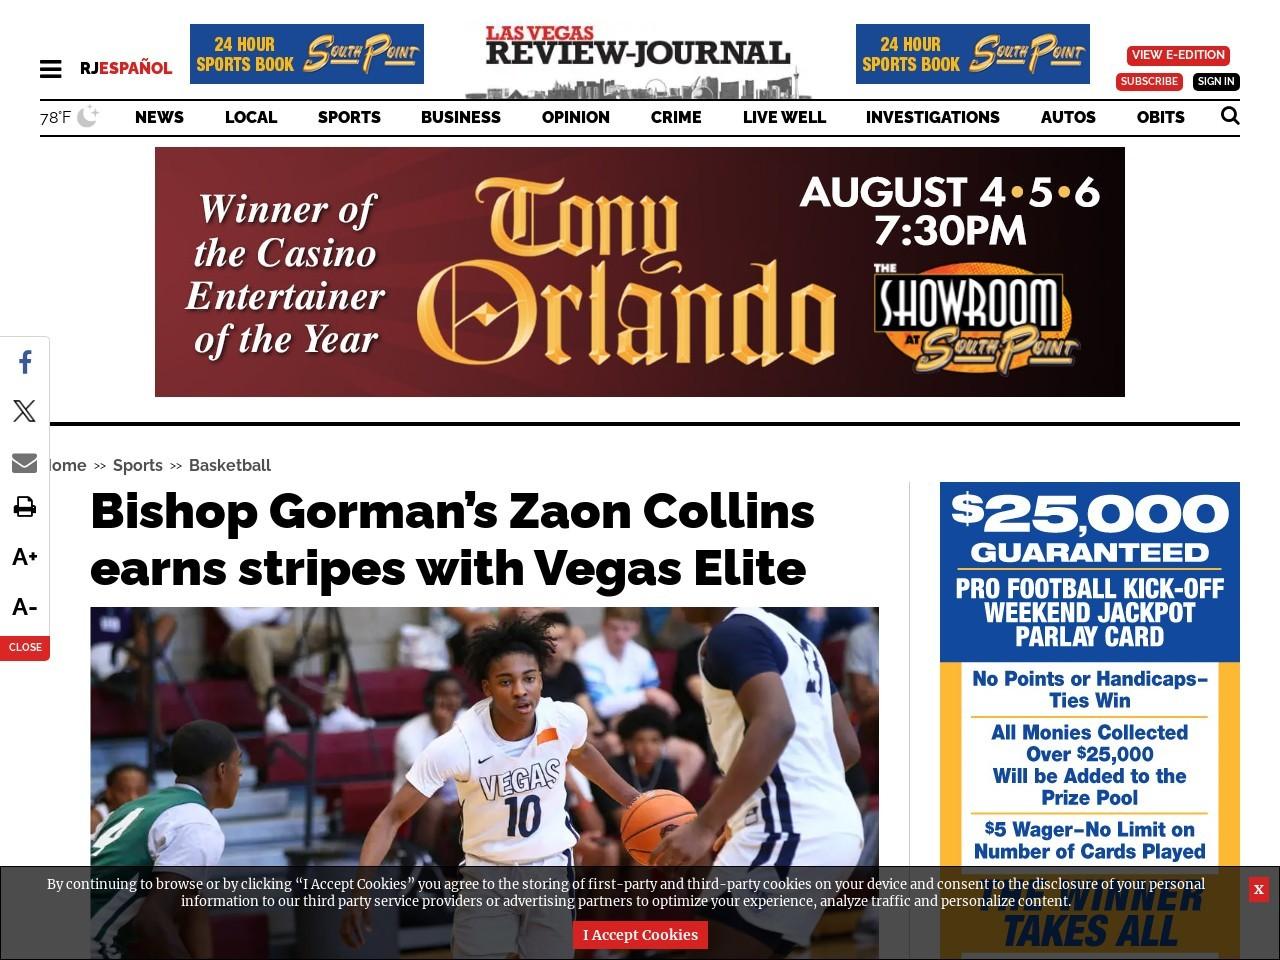 Bishop Gorman's Zaon Collins earns stripes with Vegas Elite